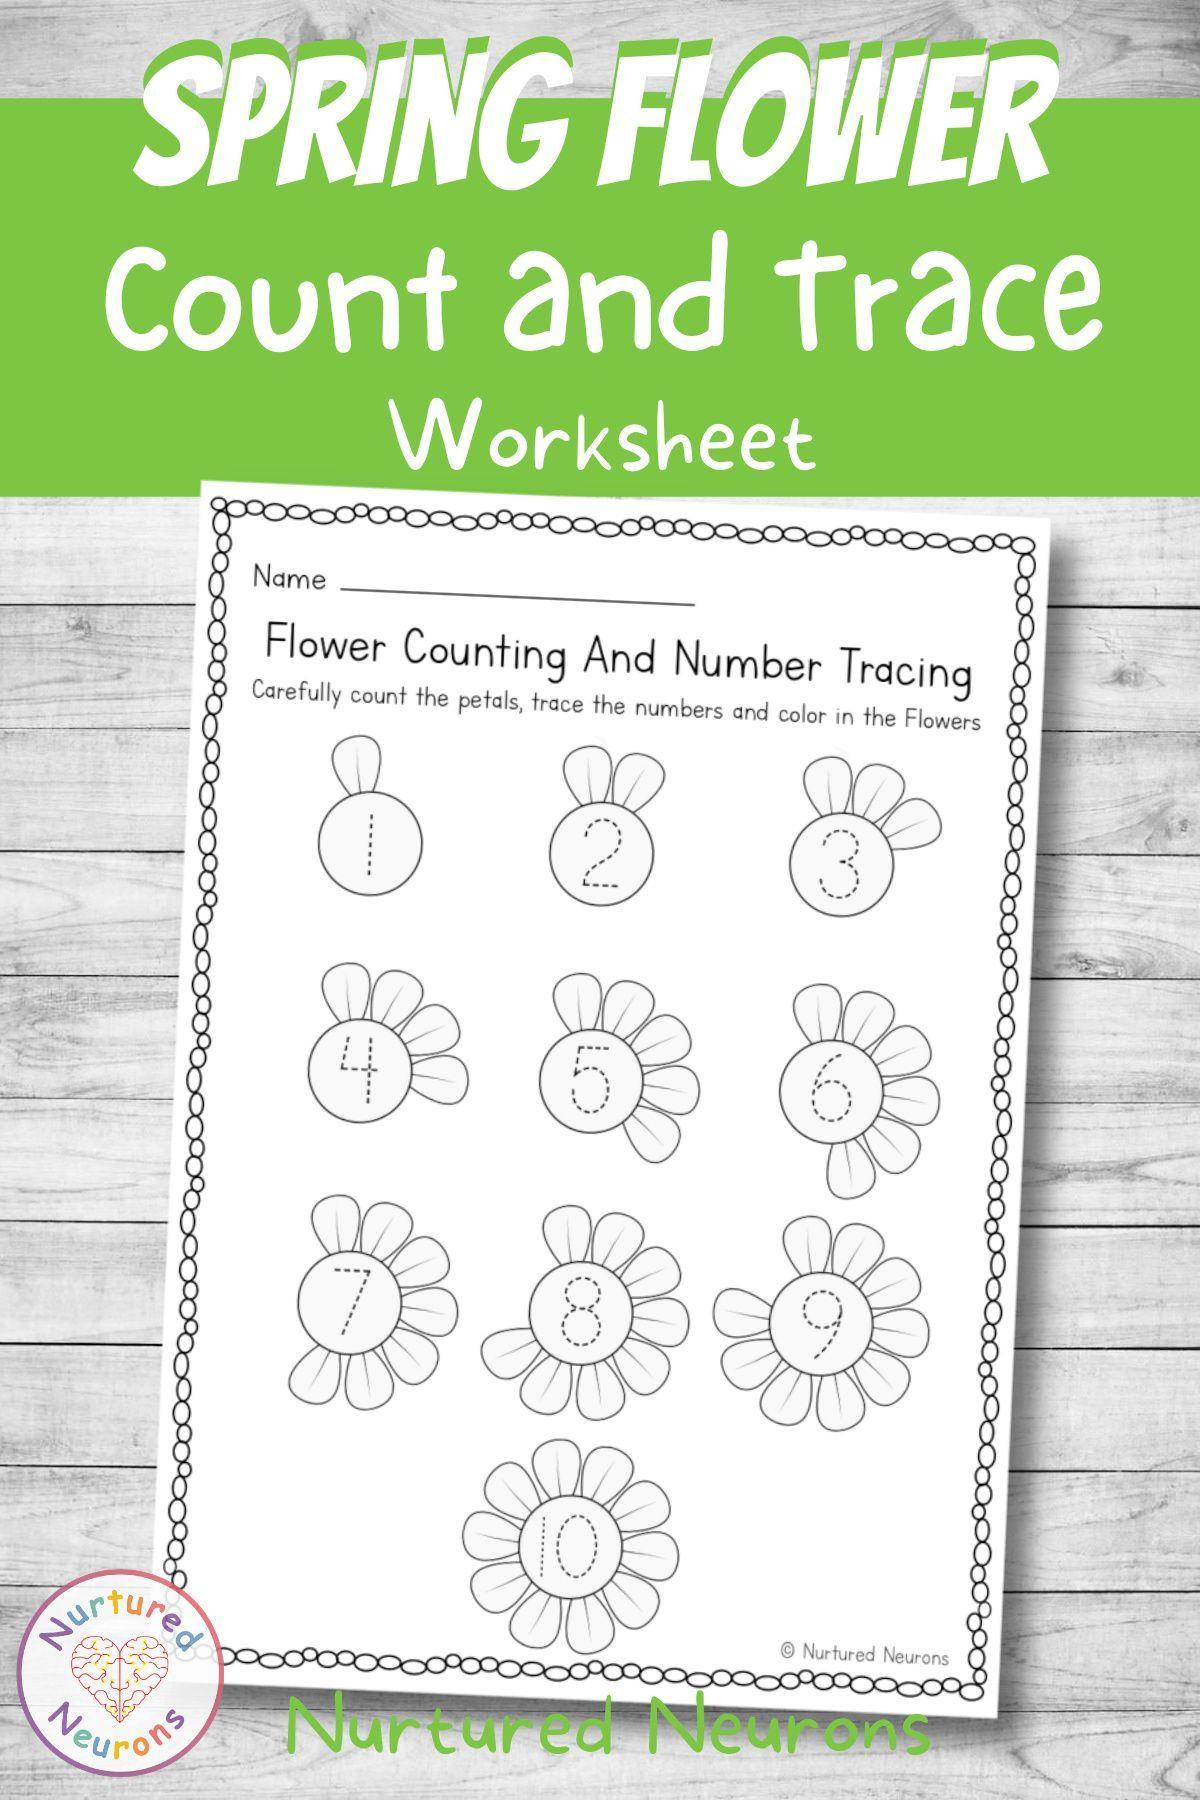 Spring Flower Counting Tracing And Coloring Worksheet Nurtured Neurons In 2021 Prewriting Skills Preschool Tracing Flower Math [ 1800 x 1200 Pixel ]